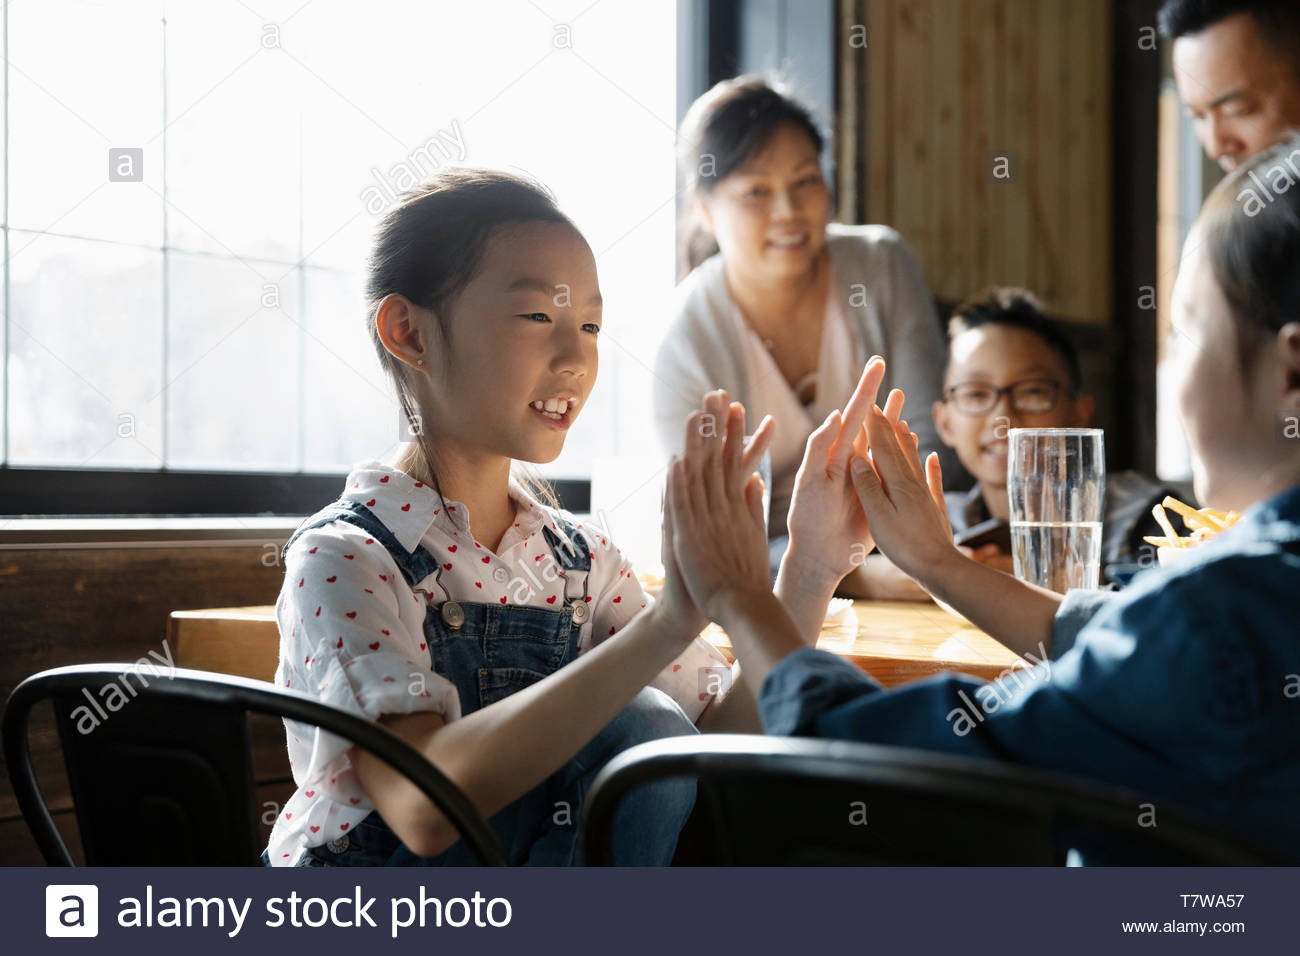 Hermanas tocando palmas juego en restaurante Imagen De Stock